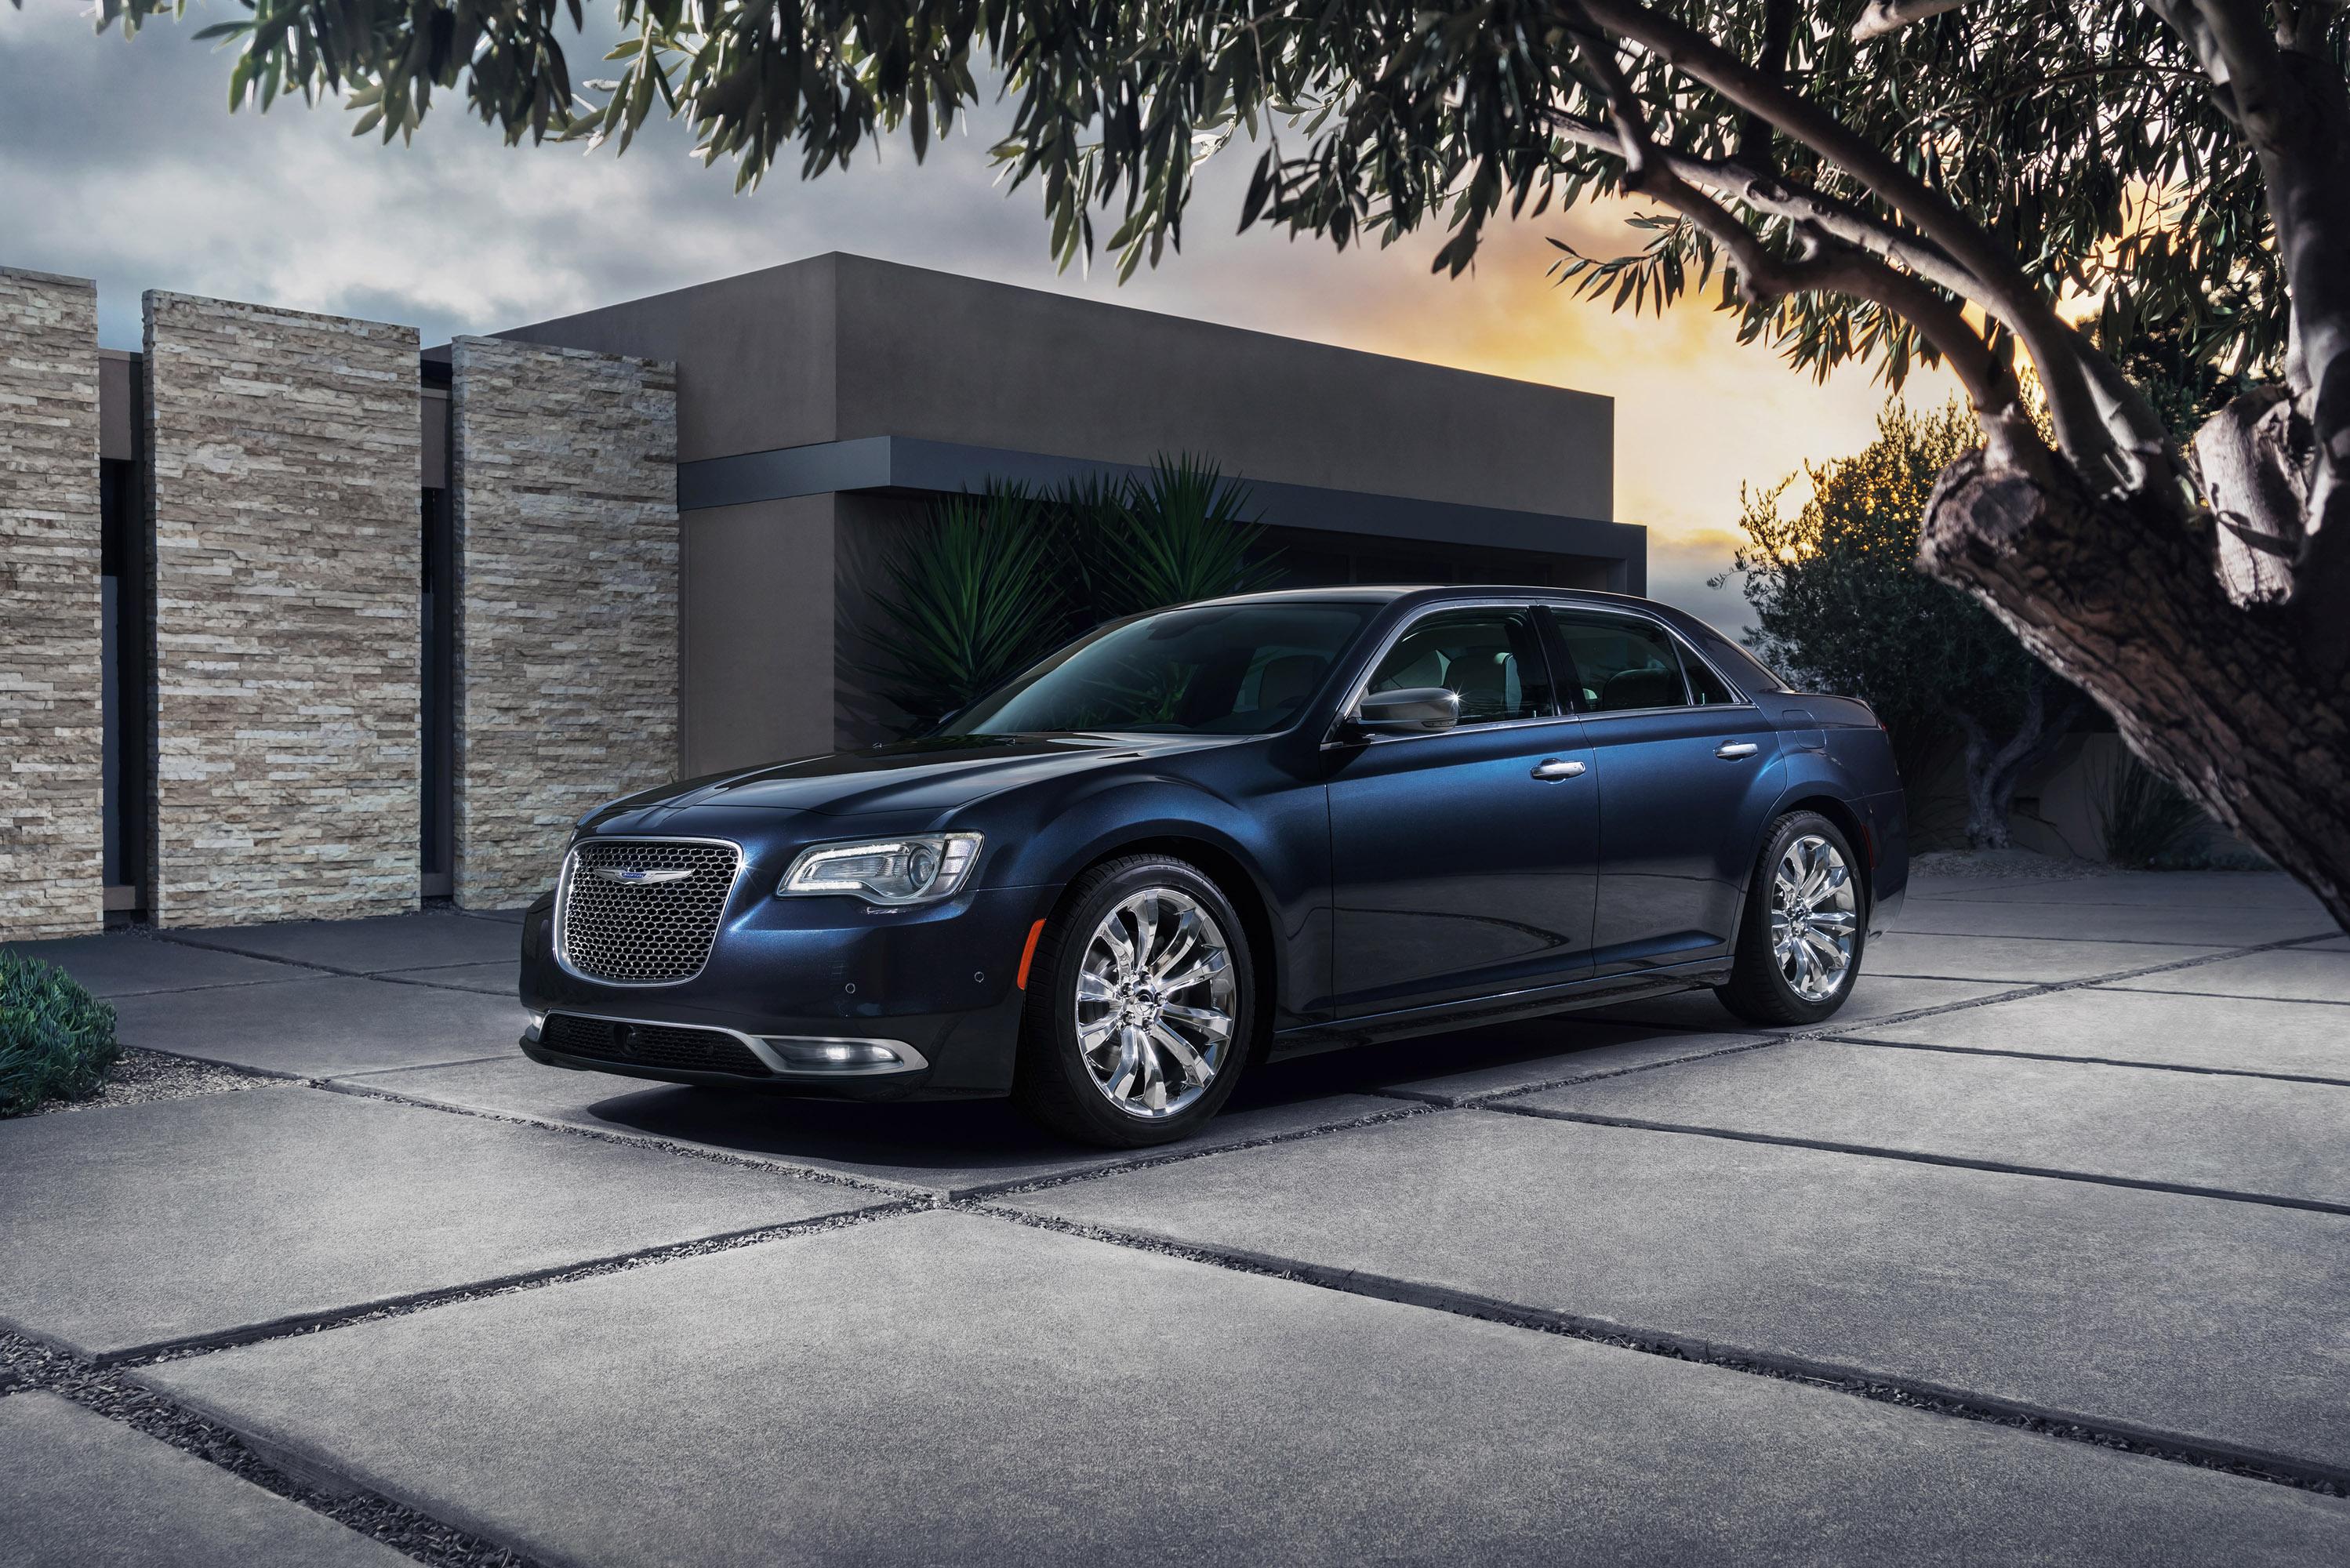 Chrysler 300 photo #1